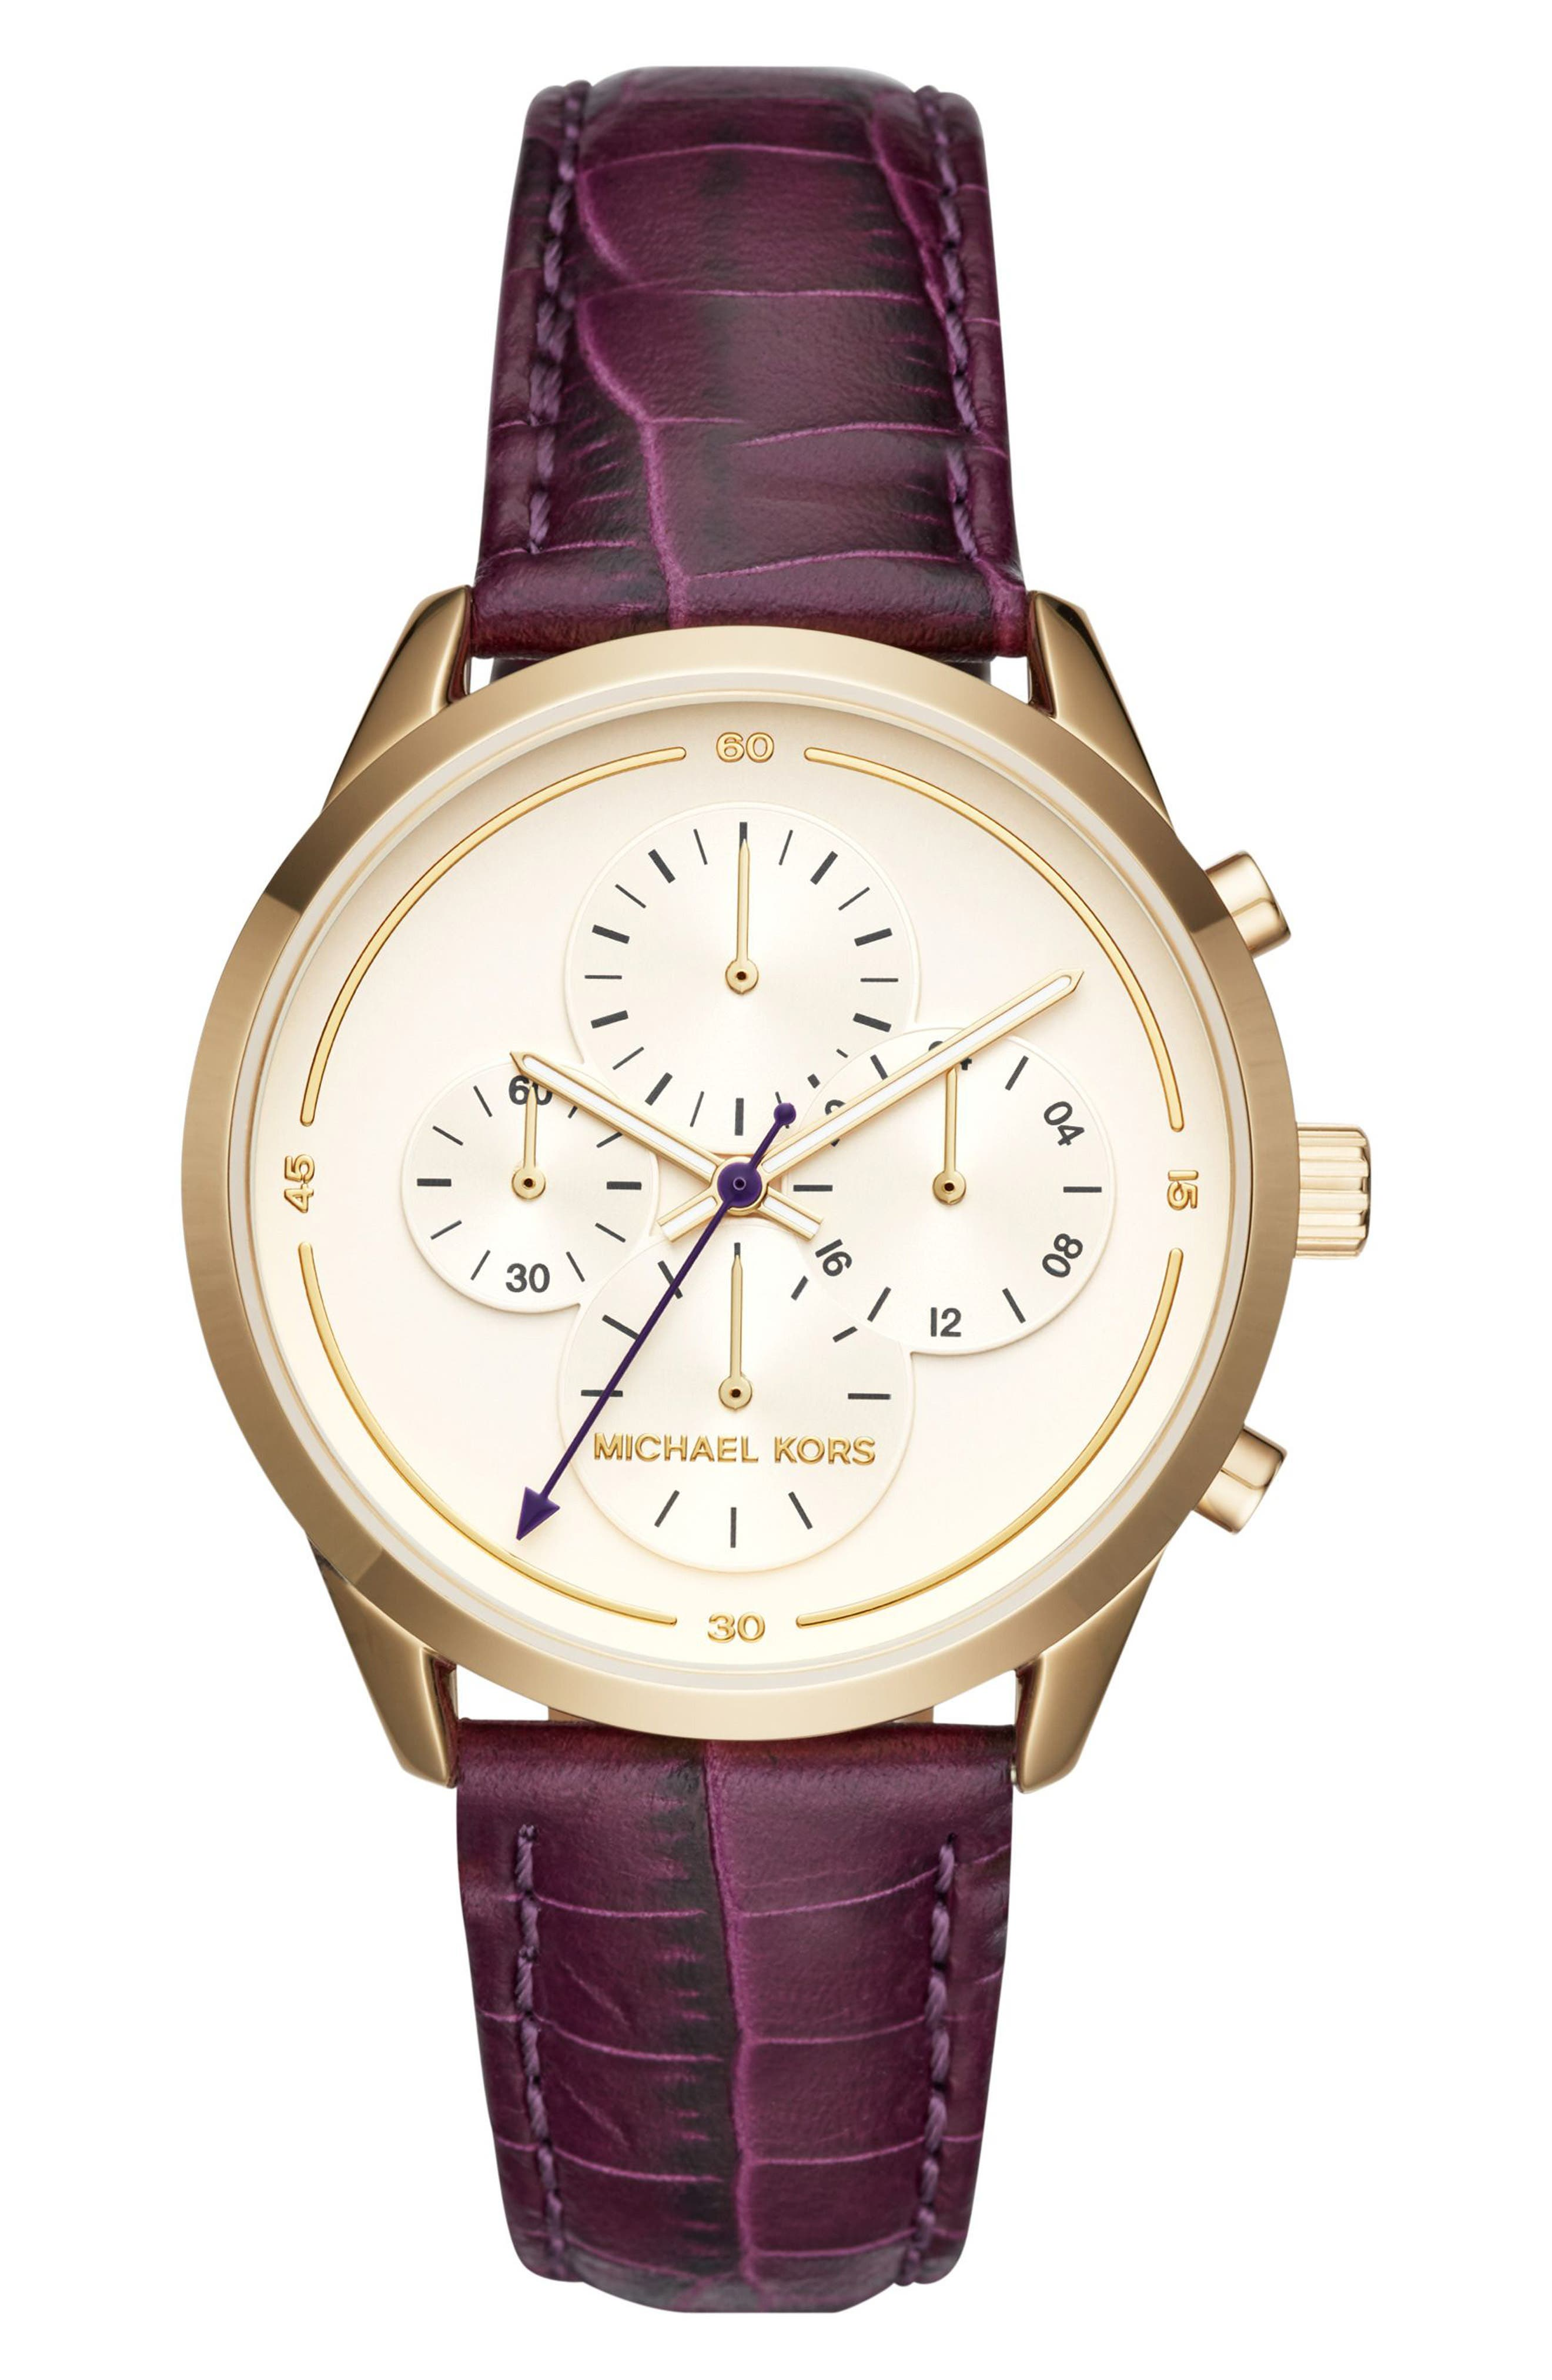 Main Image - Michael Kors Slater Chronograph Leather Strap Watch, 40mm